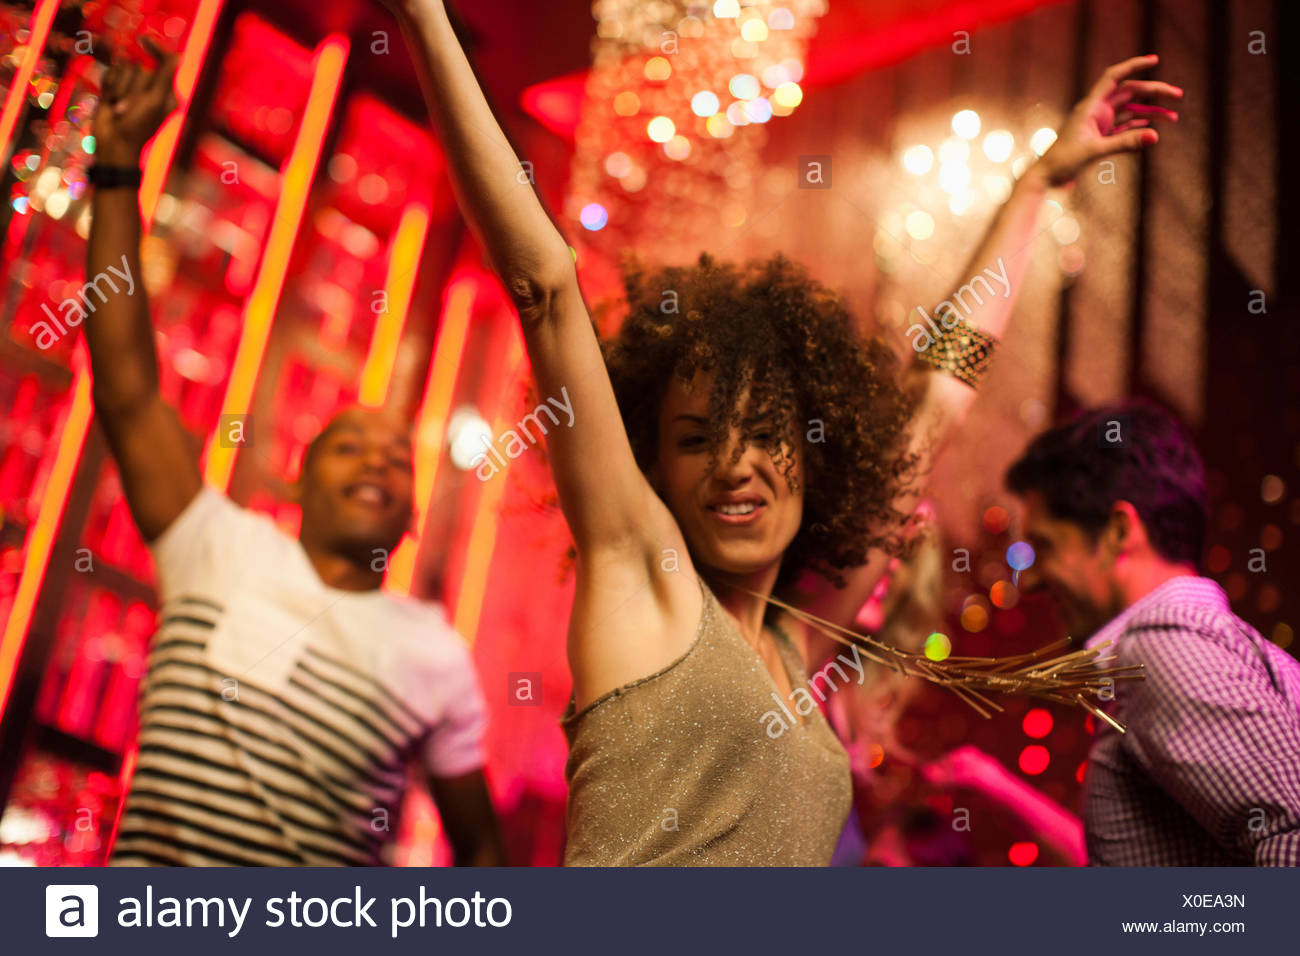 Les amis de la danse at nightclub Photo Stock